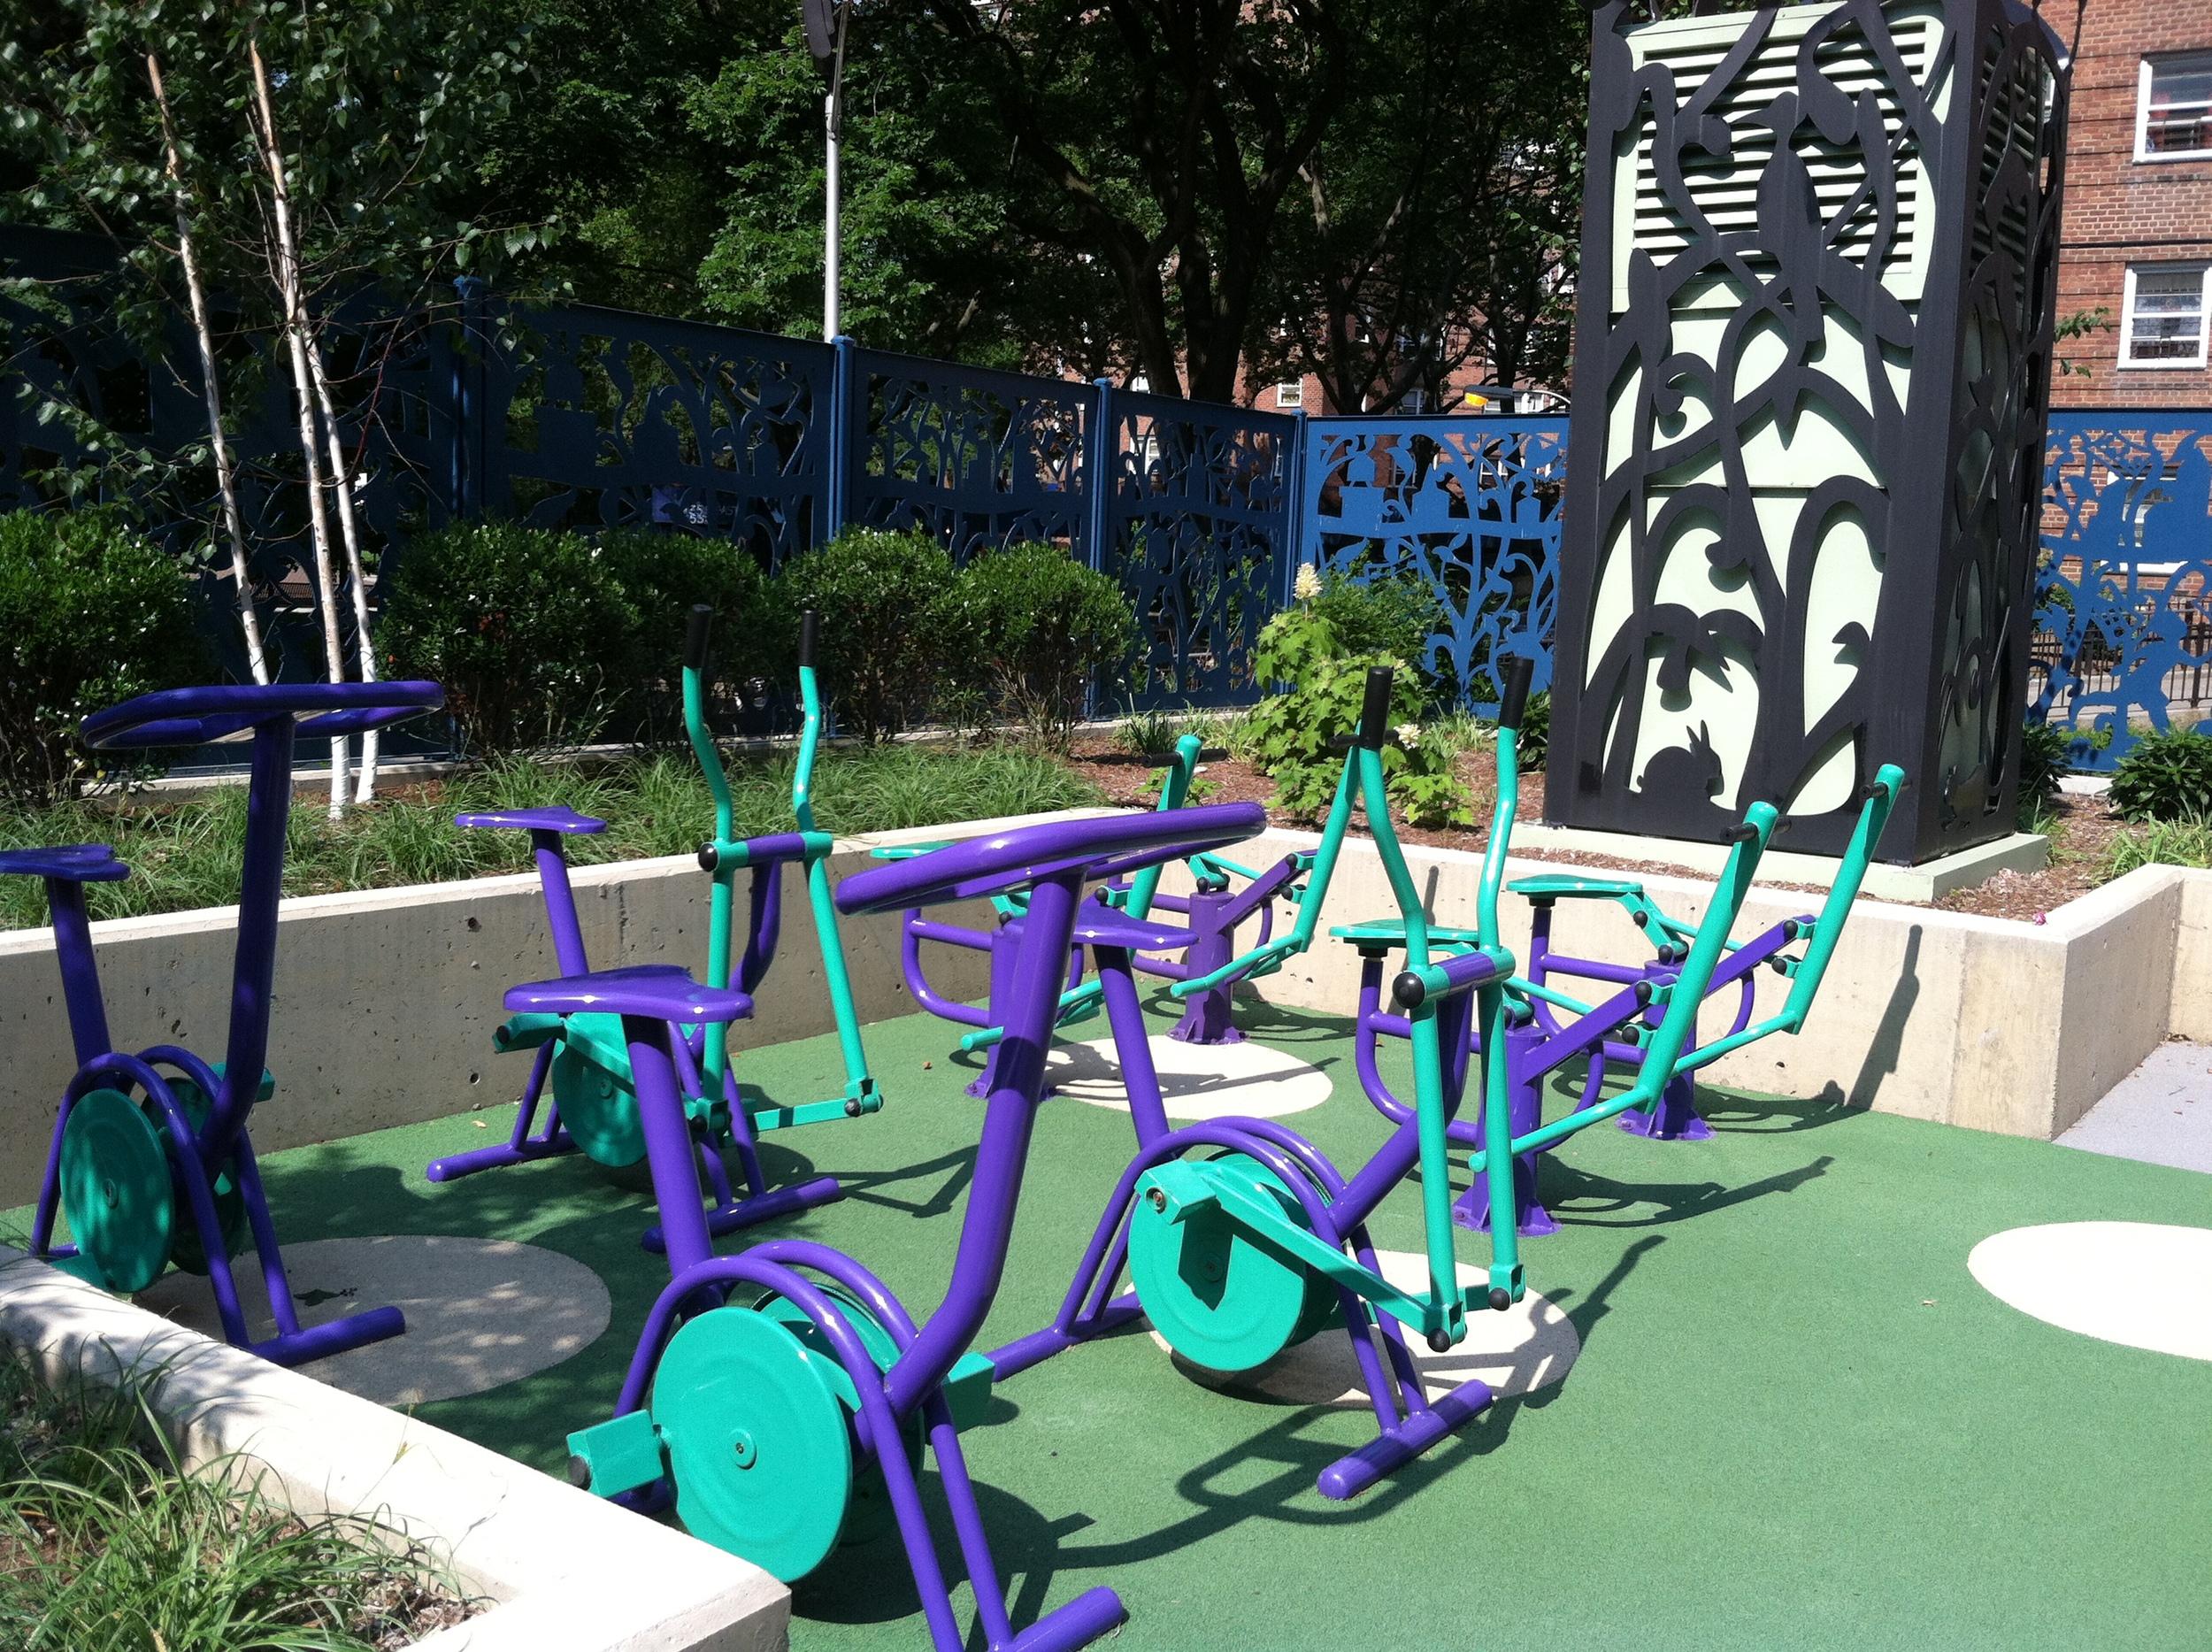 Arbor House_outdoor exercise equipment.jpg